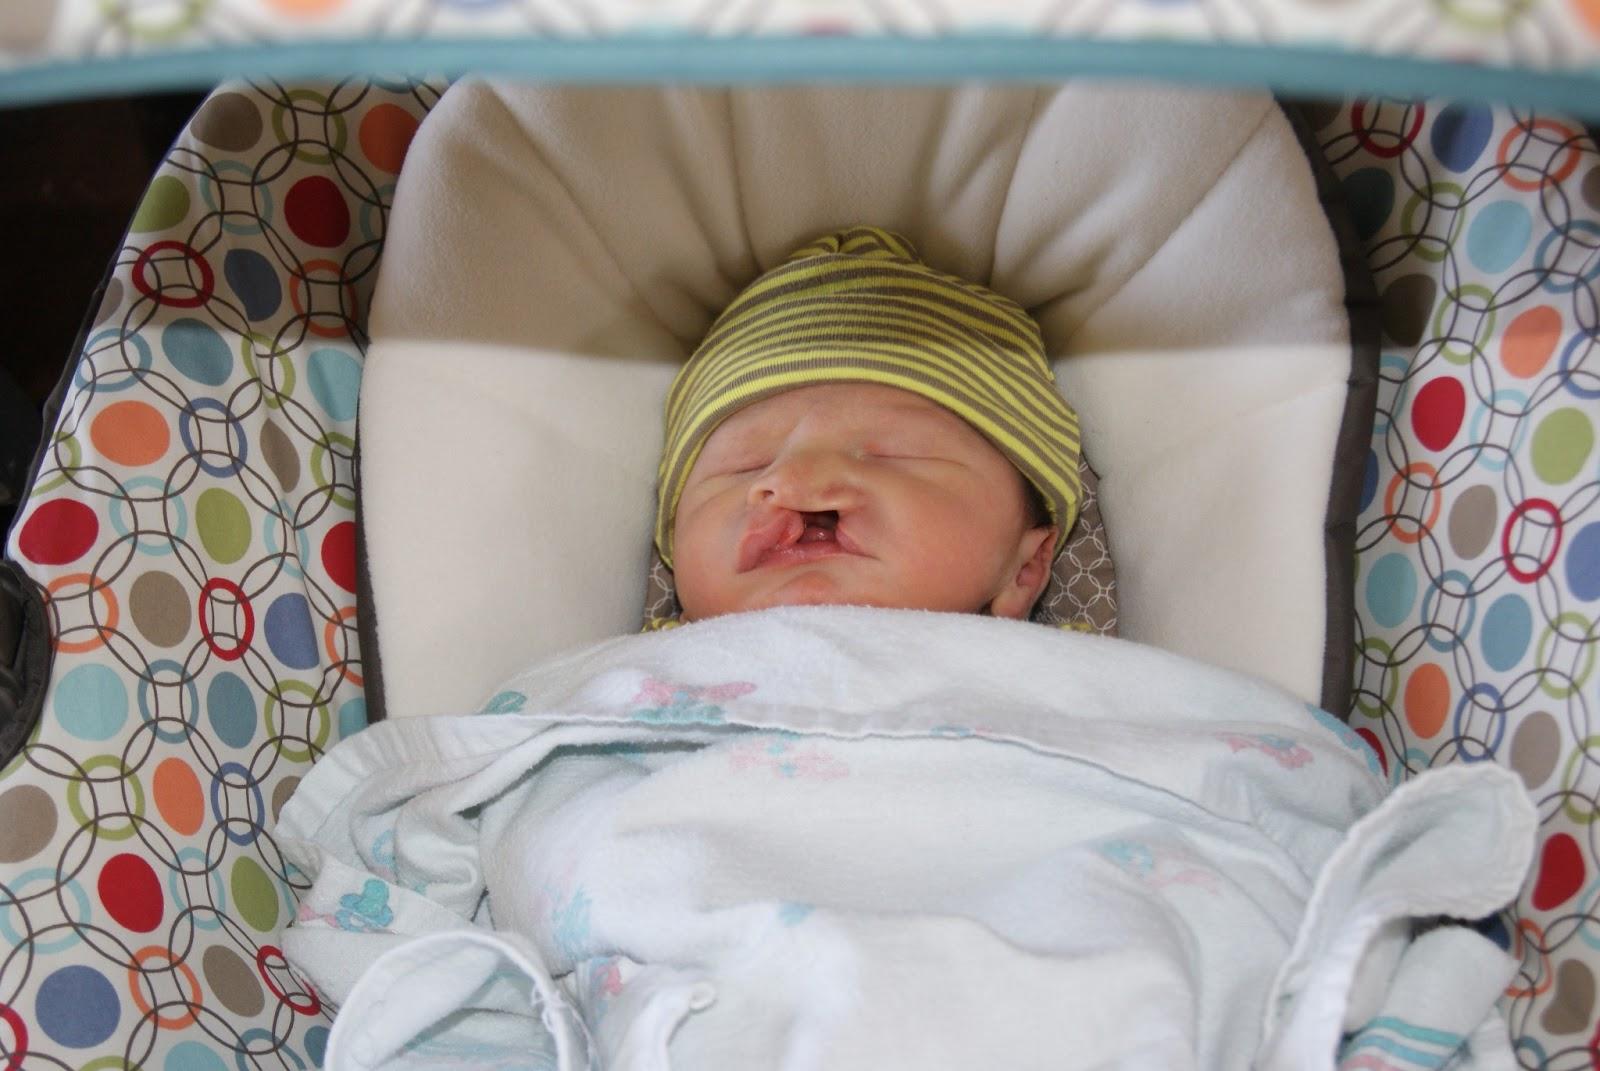 Baby With Recessed Chin | life love lip balm micrognathia